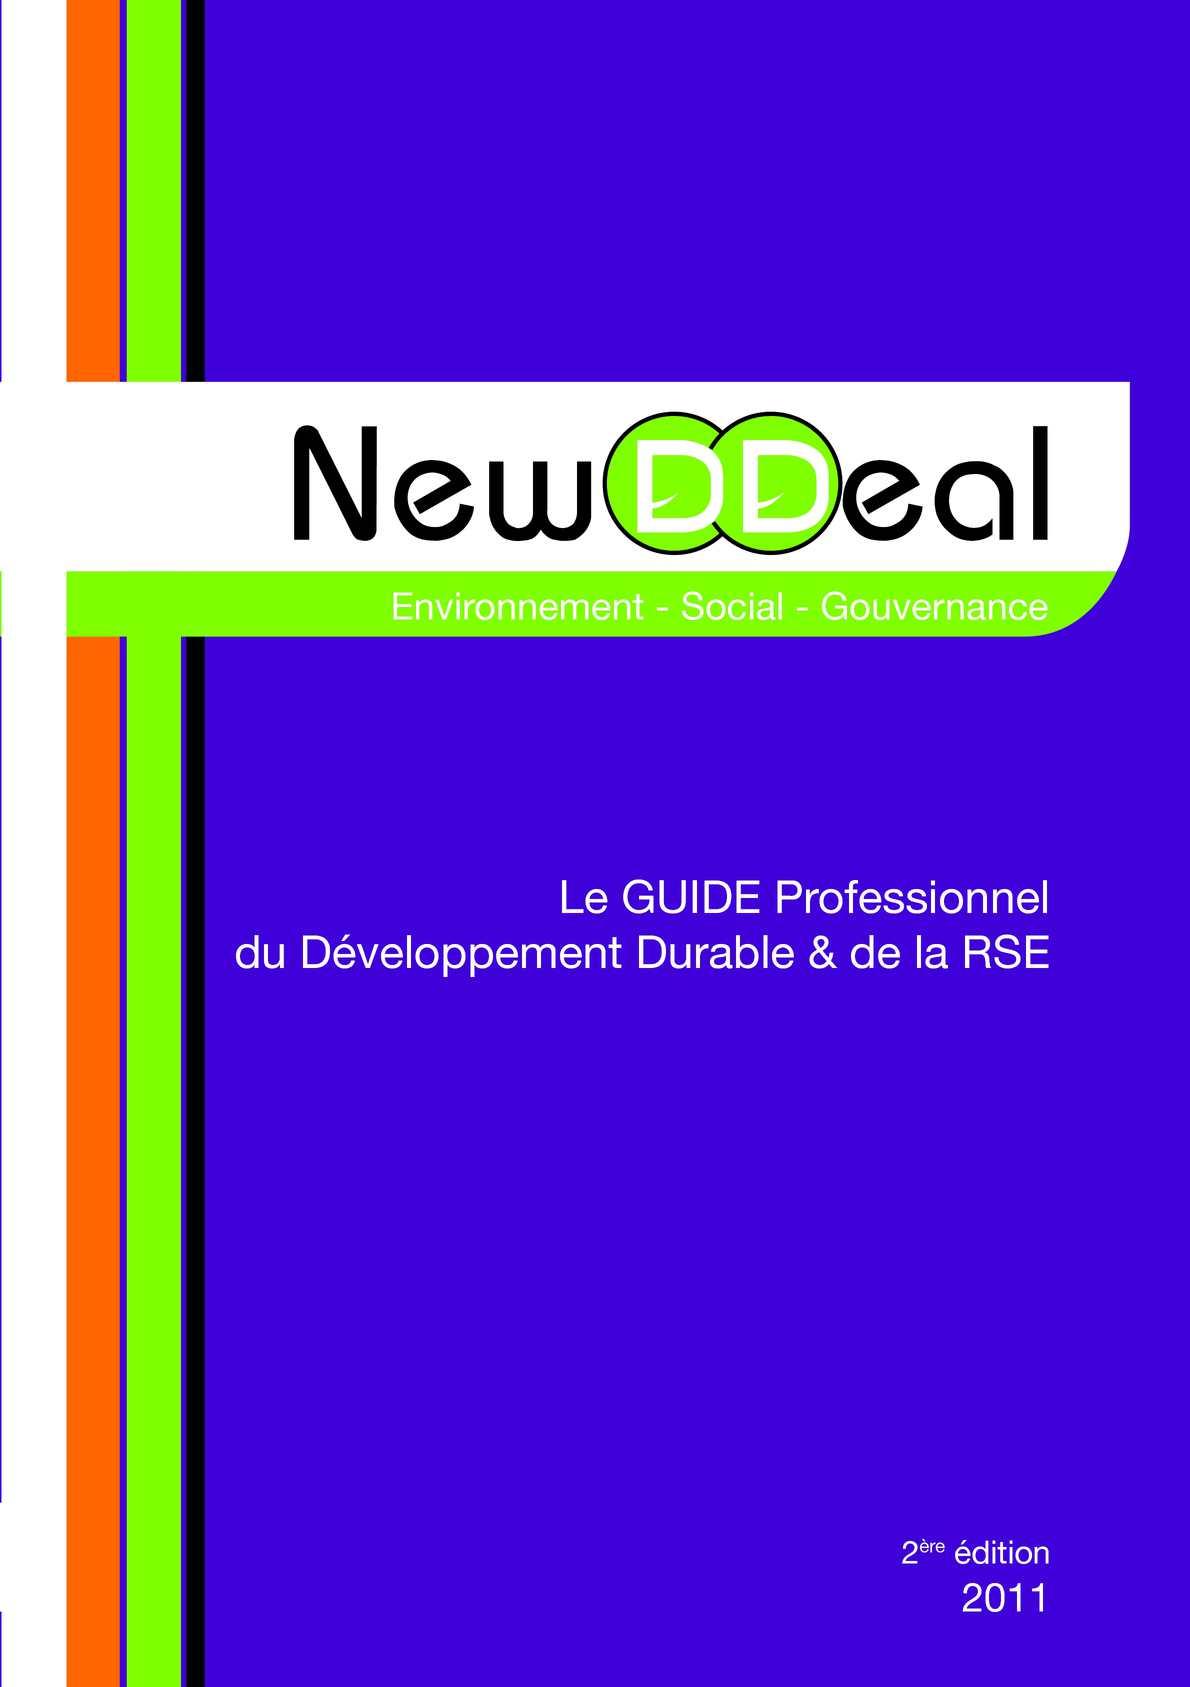 Calam o guide newddeal 2011 2 me dition - Plafond livret developpement durable societe generale ...